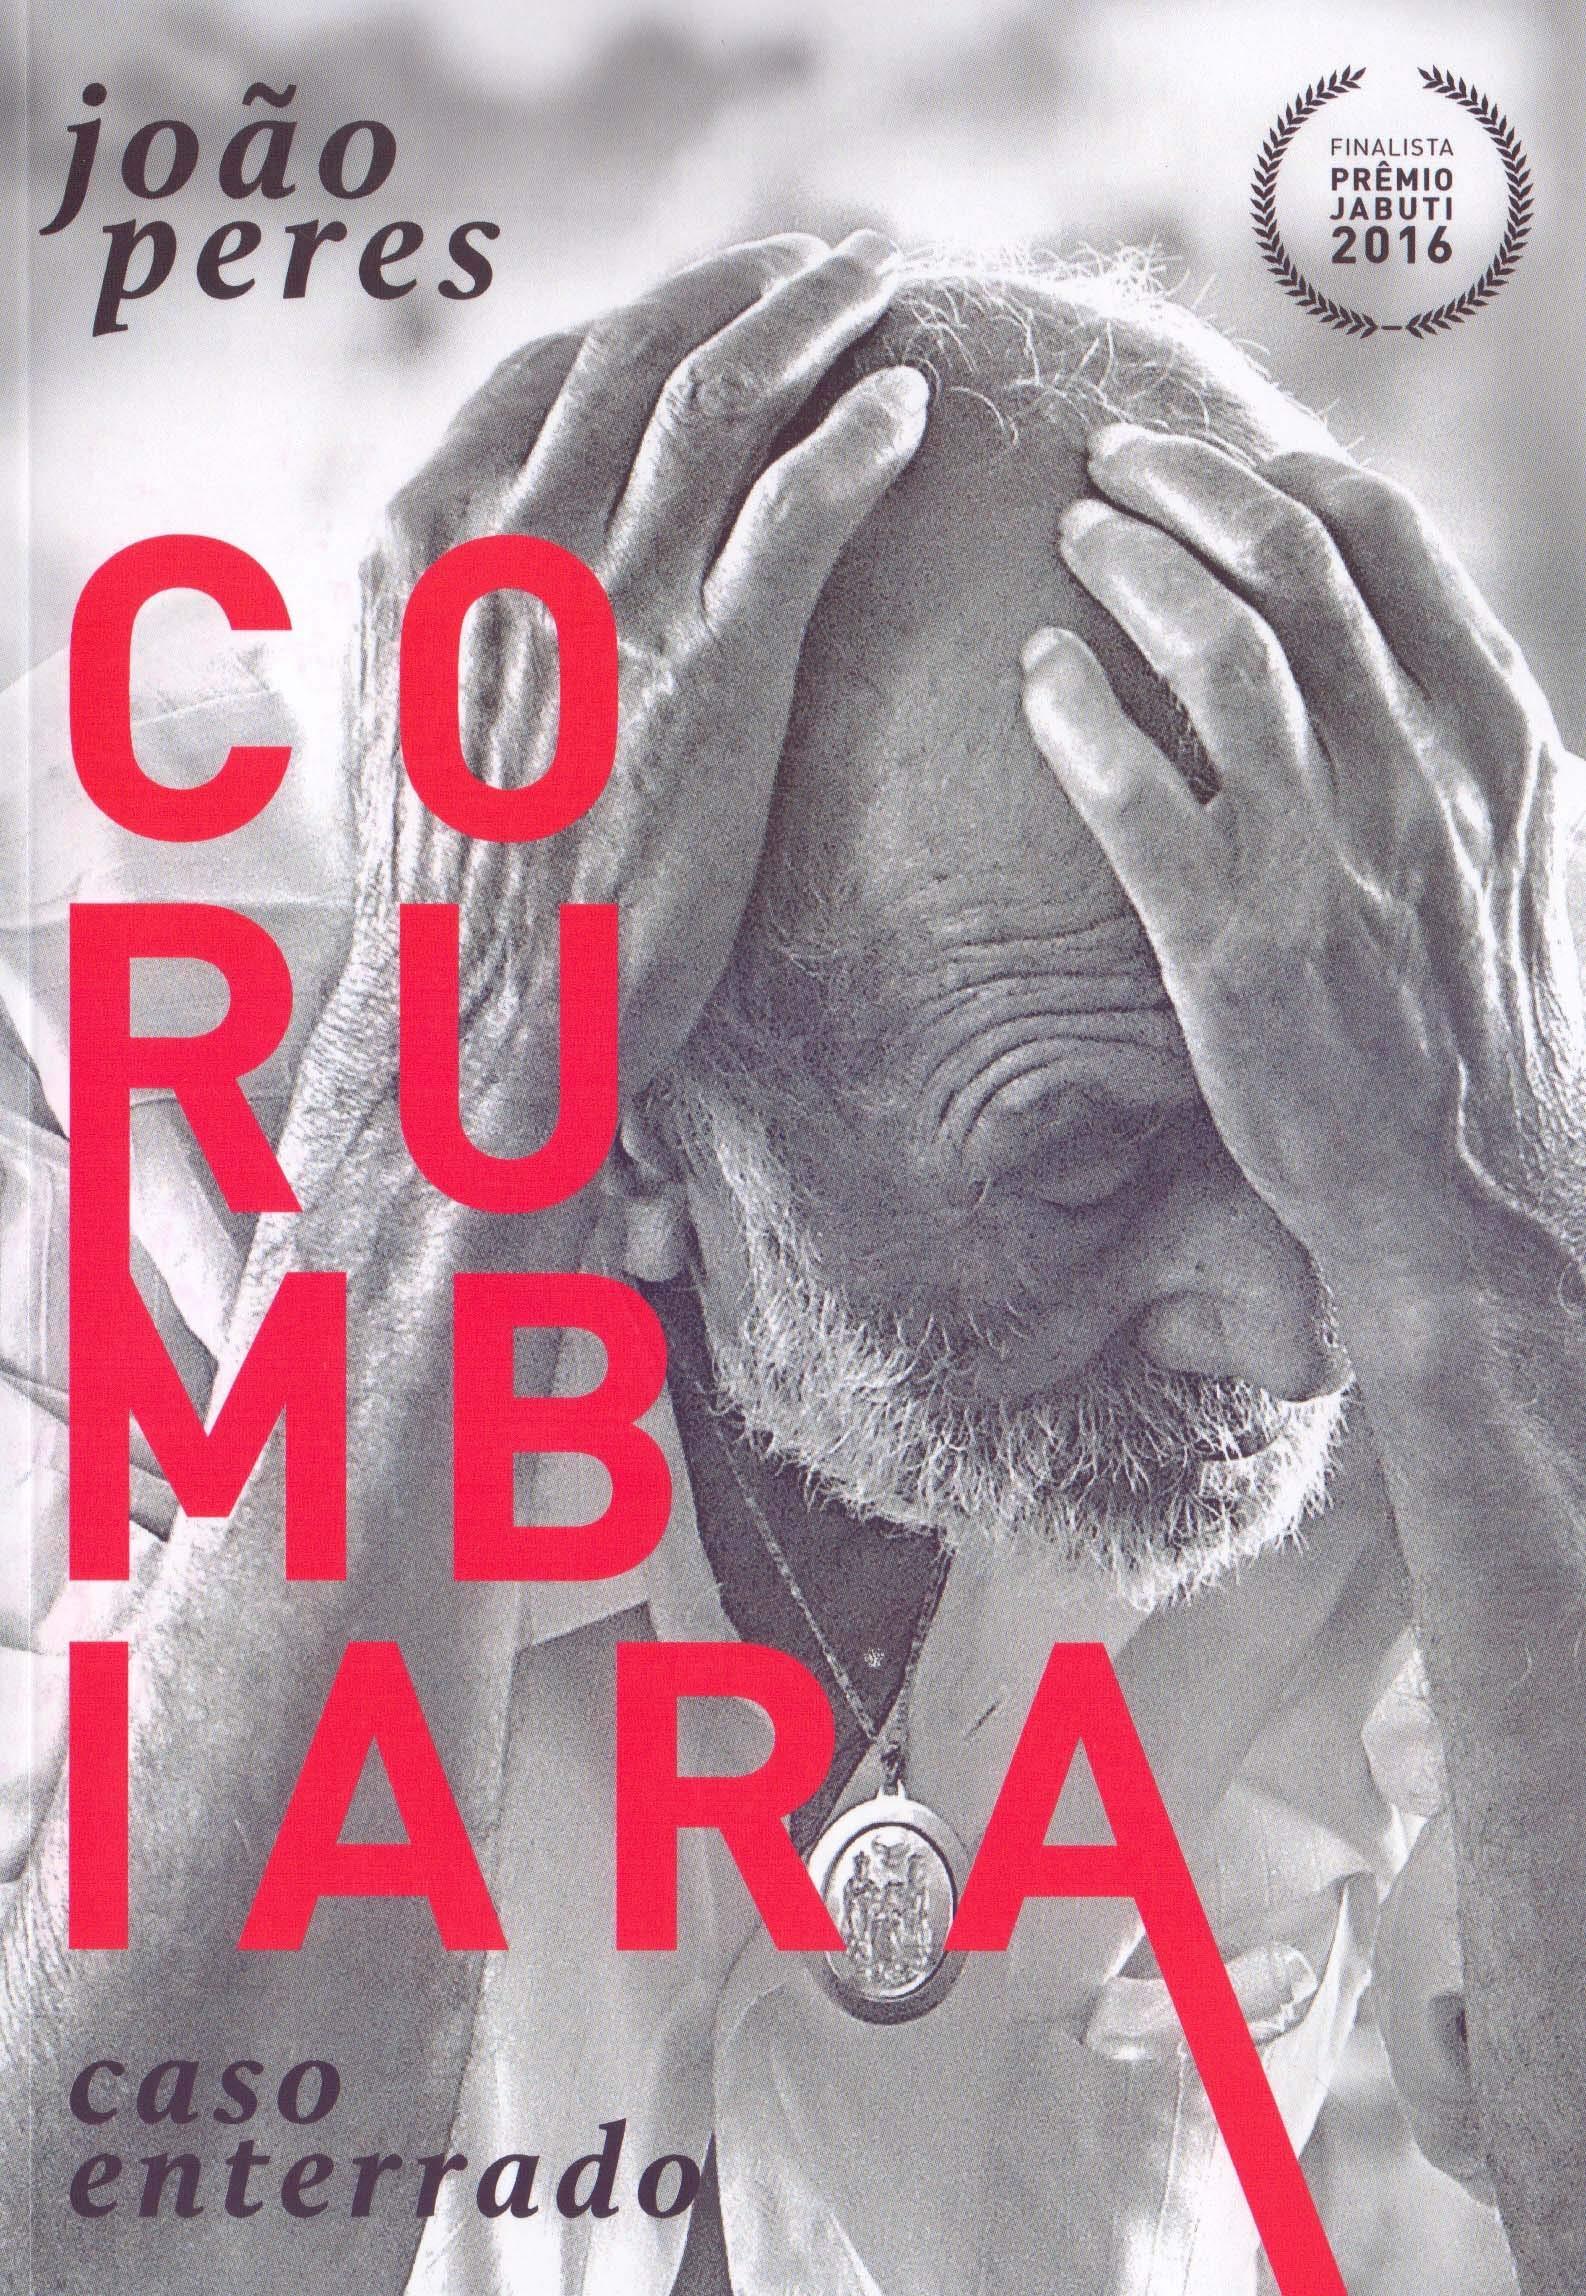 Corumbiara, caso enterrado, livro de João Peres